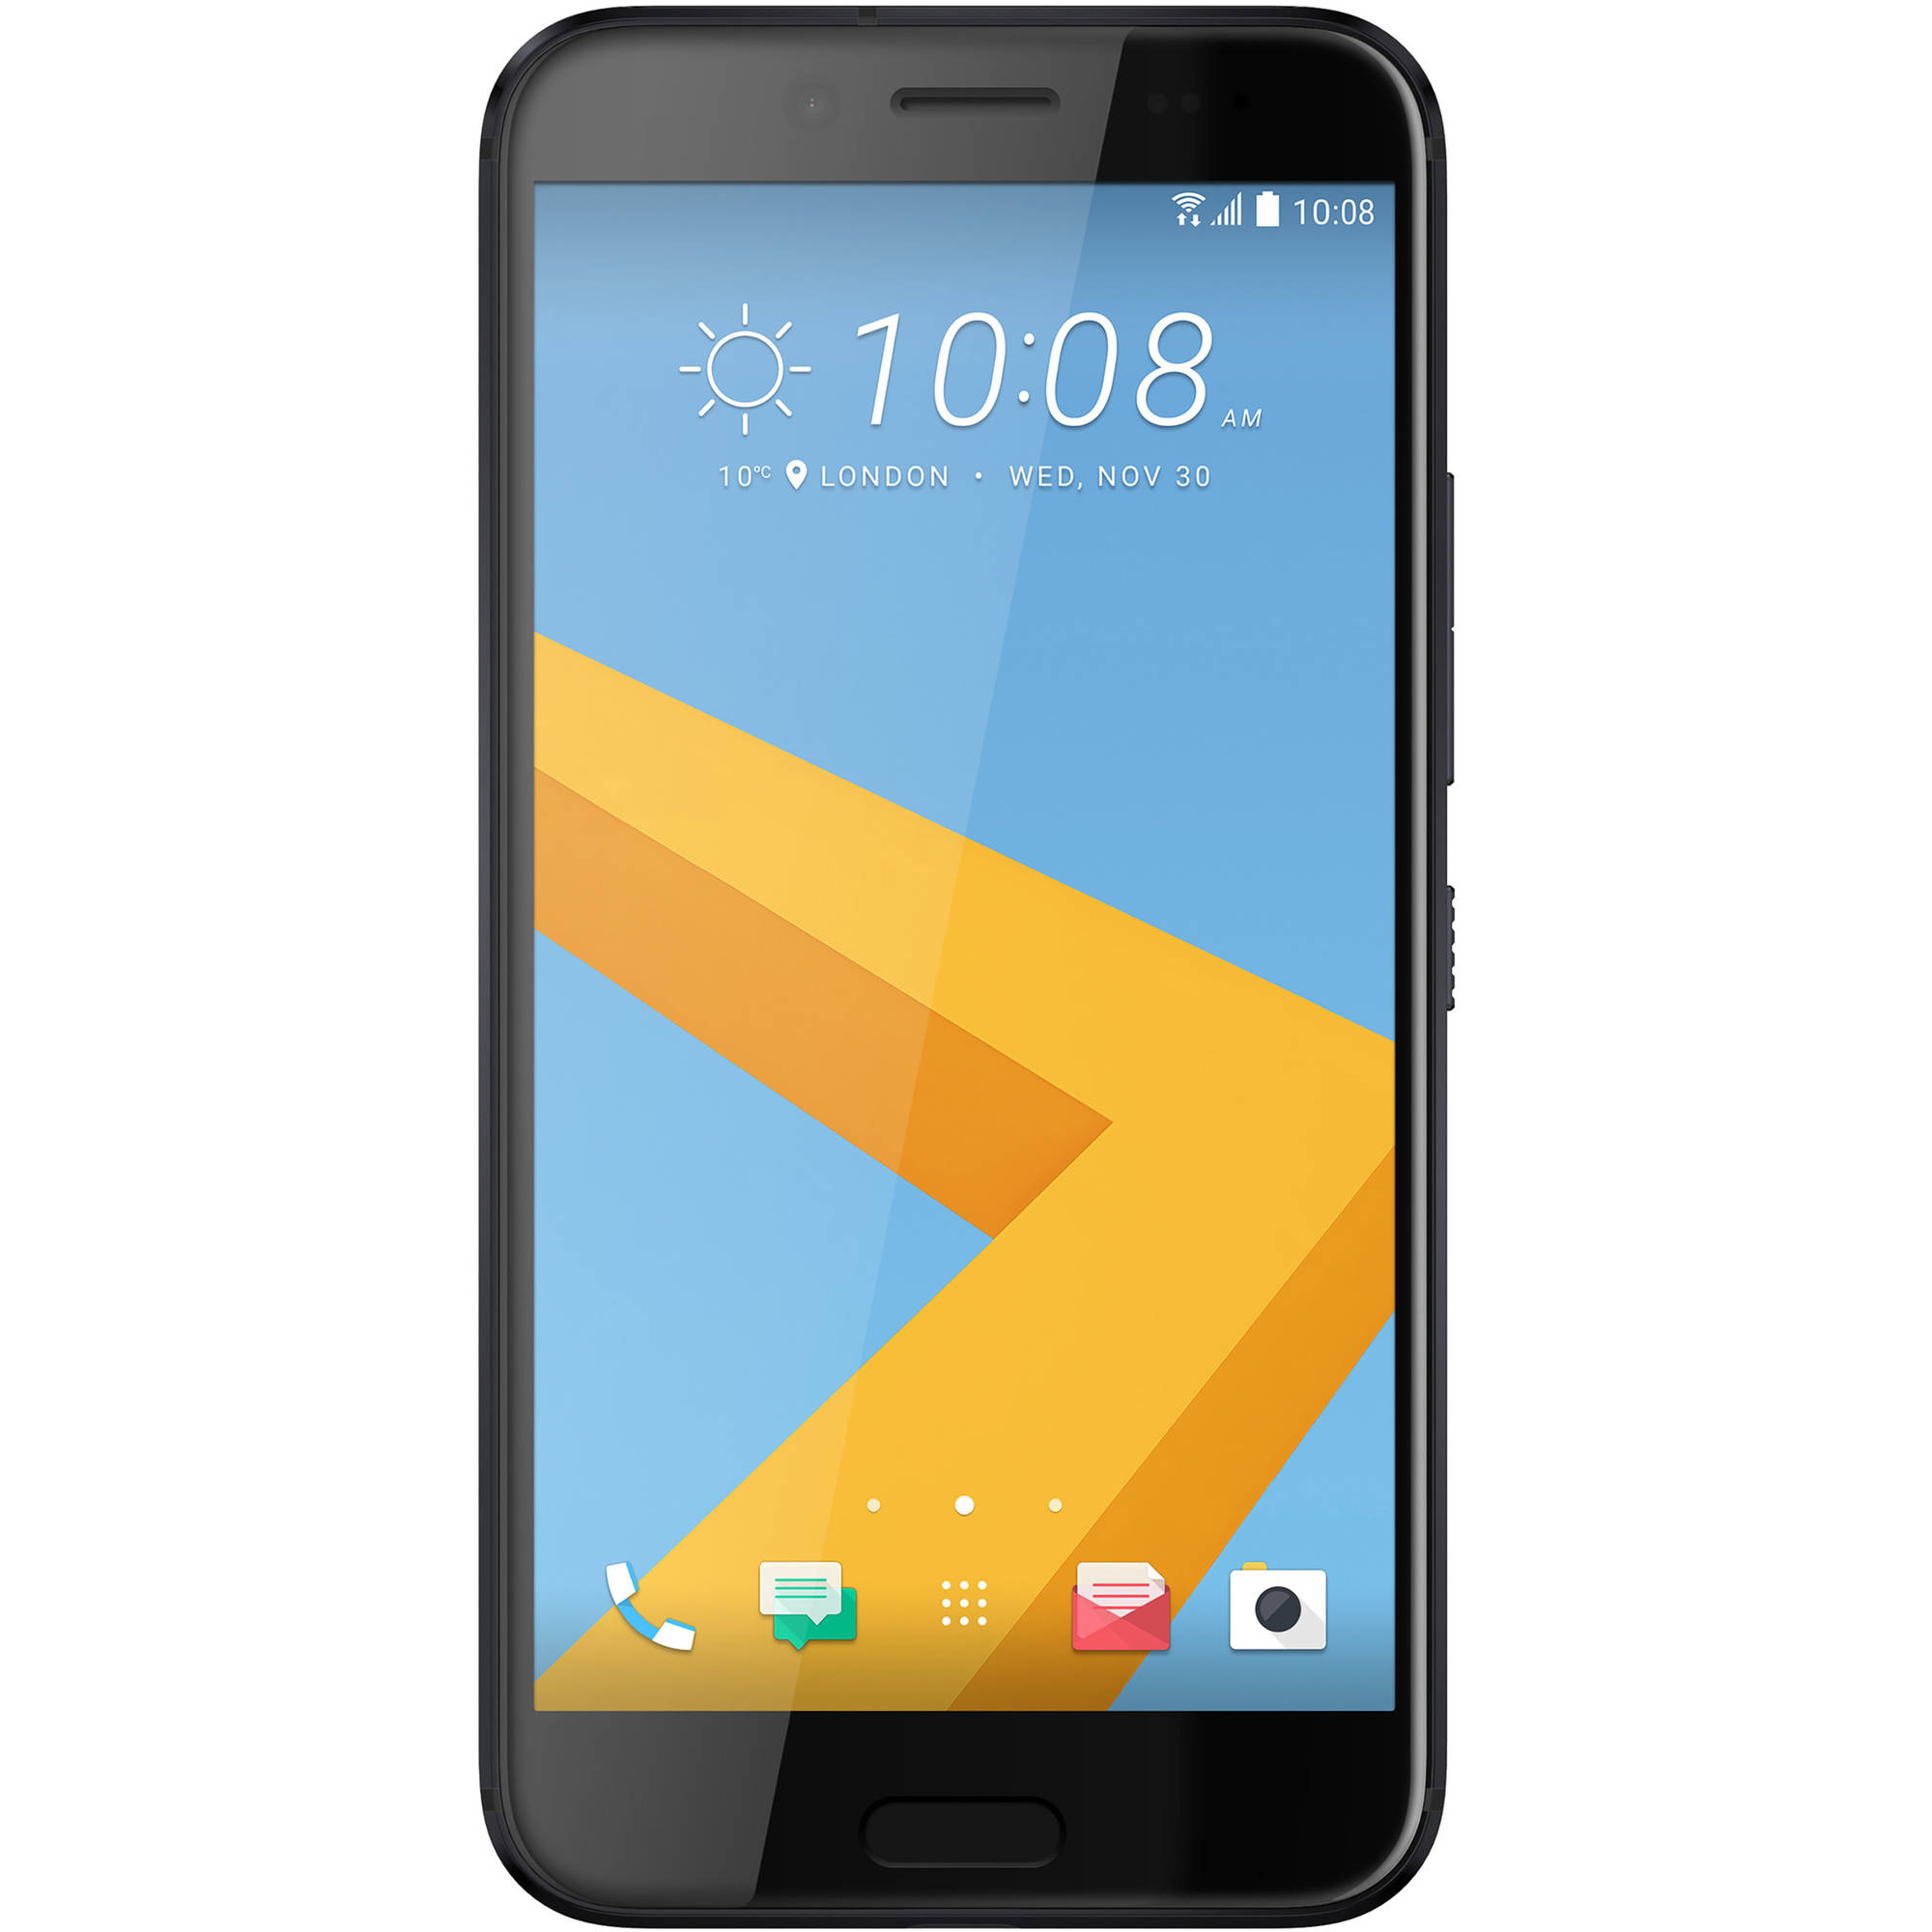 HTC 10 evo 32GB Smartphone (Unlocked, Gunmetal Gray)